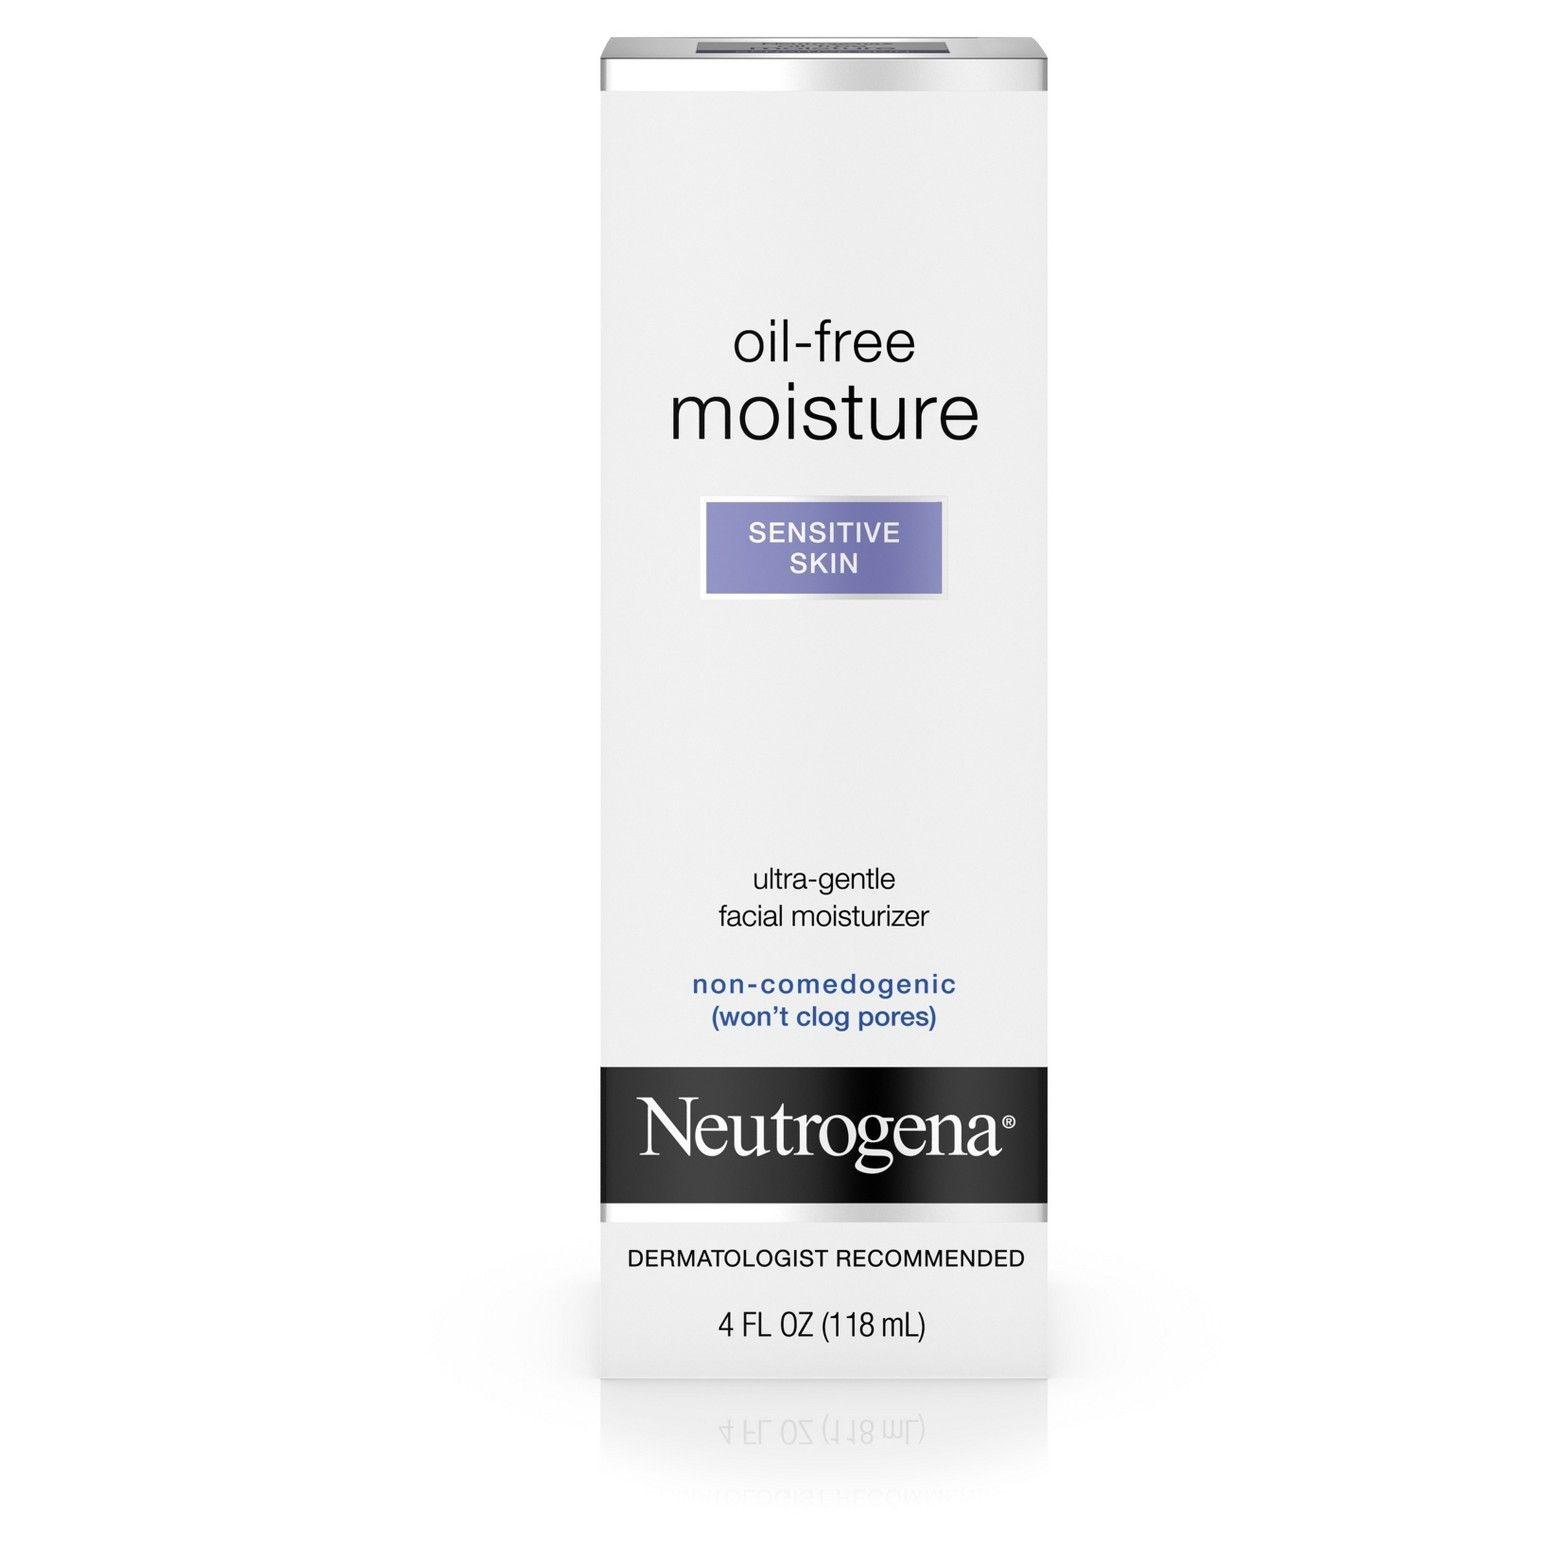 Neutrogena Oil Free Daily Sensitive Skin Face Moisturizer 4 Fl Oz Sensitive Skin Face Moisturizer Moisturizer For Sensitive Skin Sensitive Skin Face